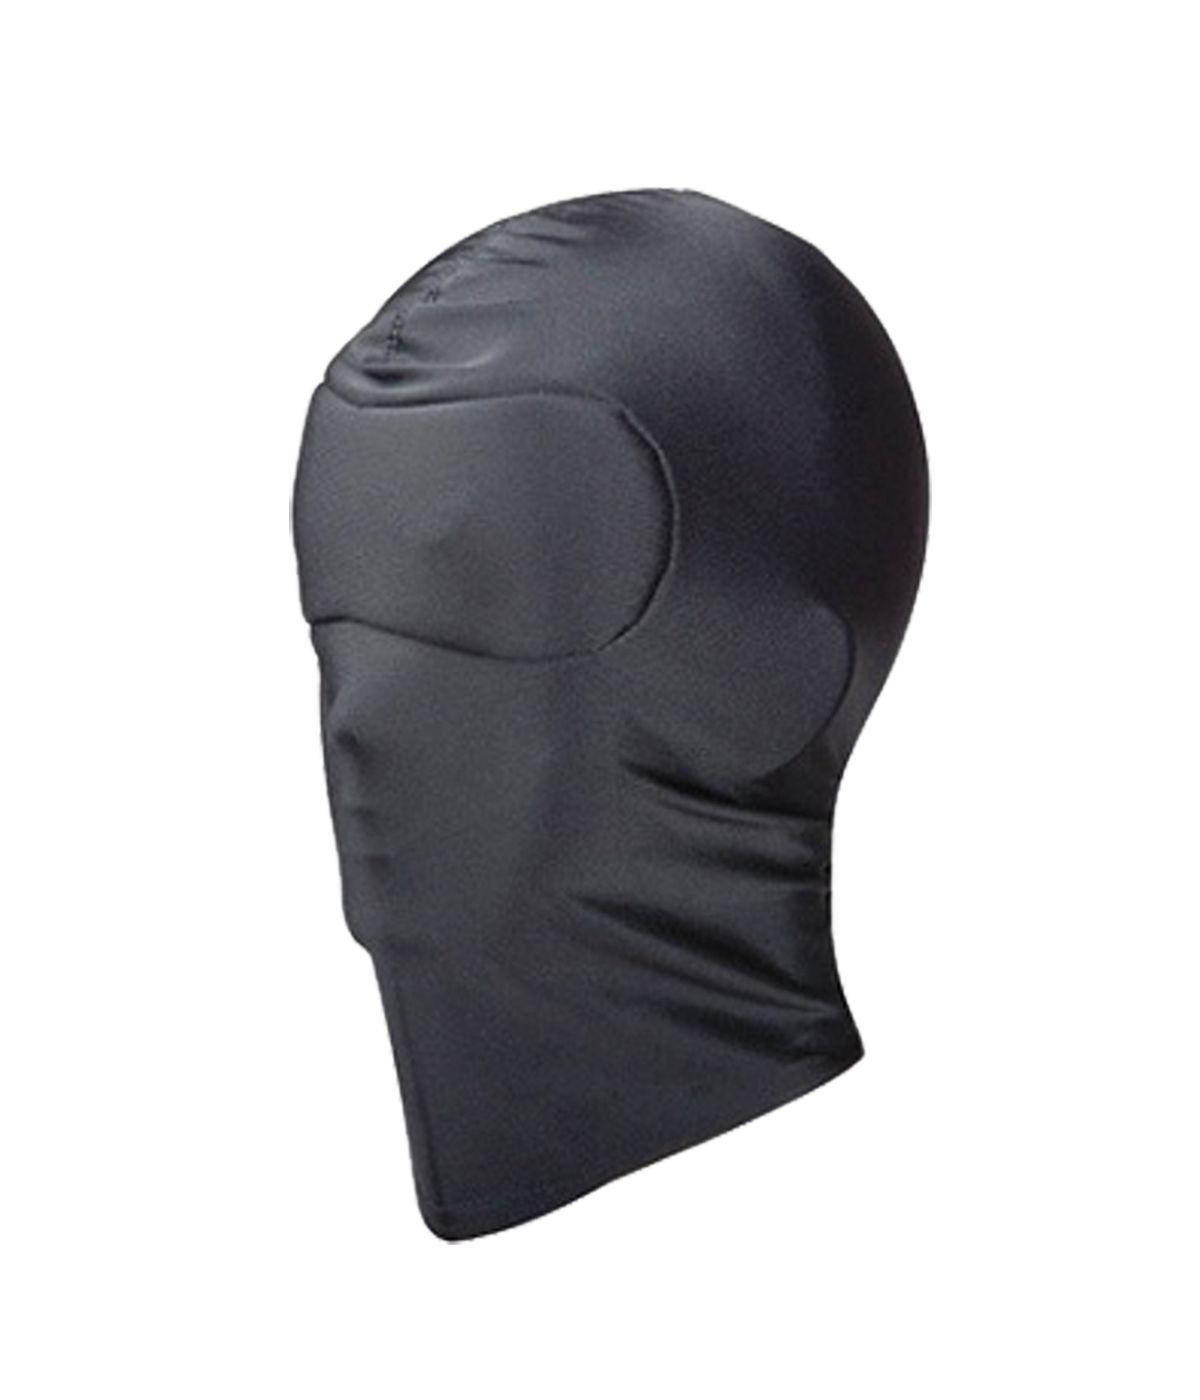 Fetish Dreams Mask Dark Secrets Black